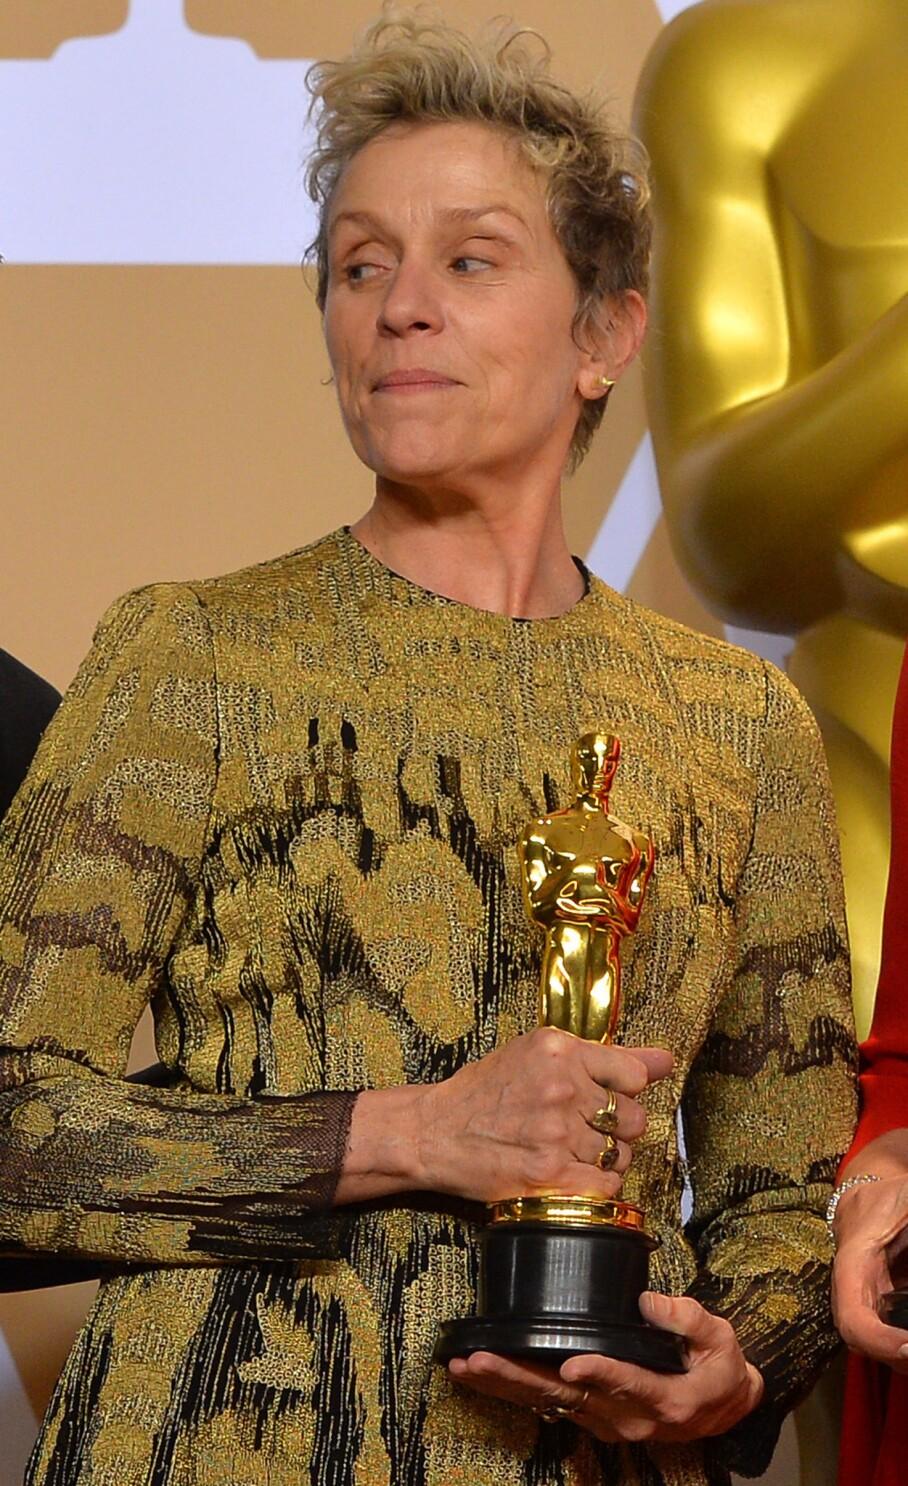 Frances McDormand's alleged Oscar thief walks as court tosses case